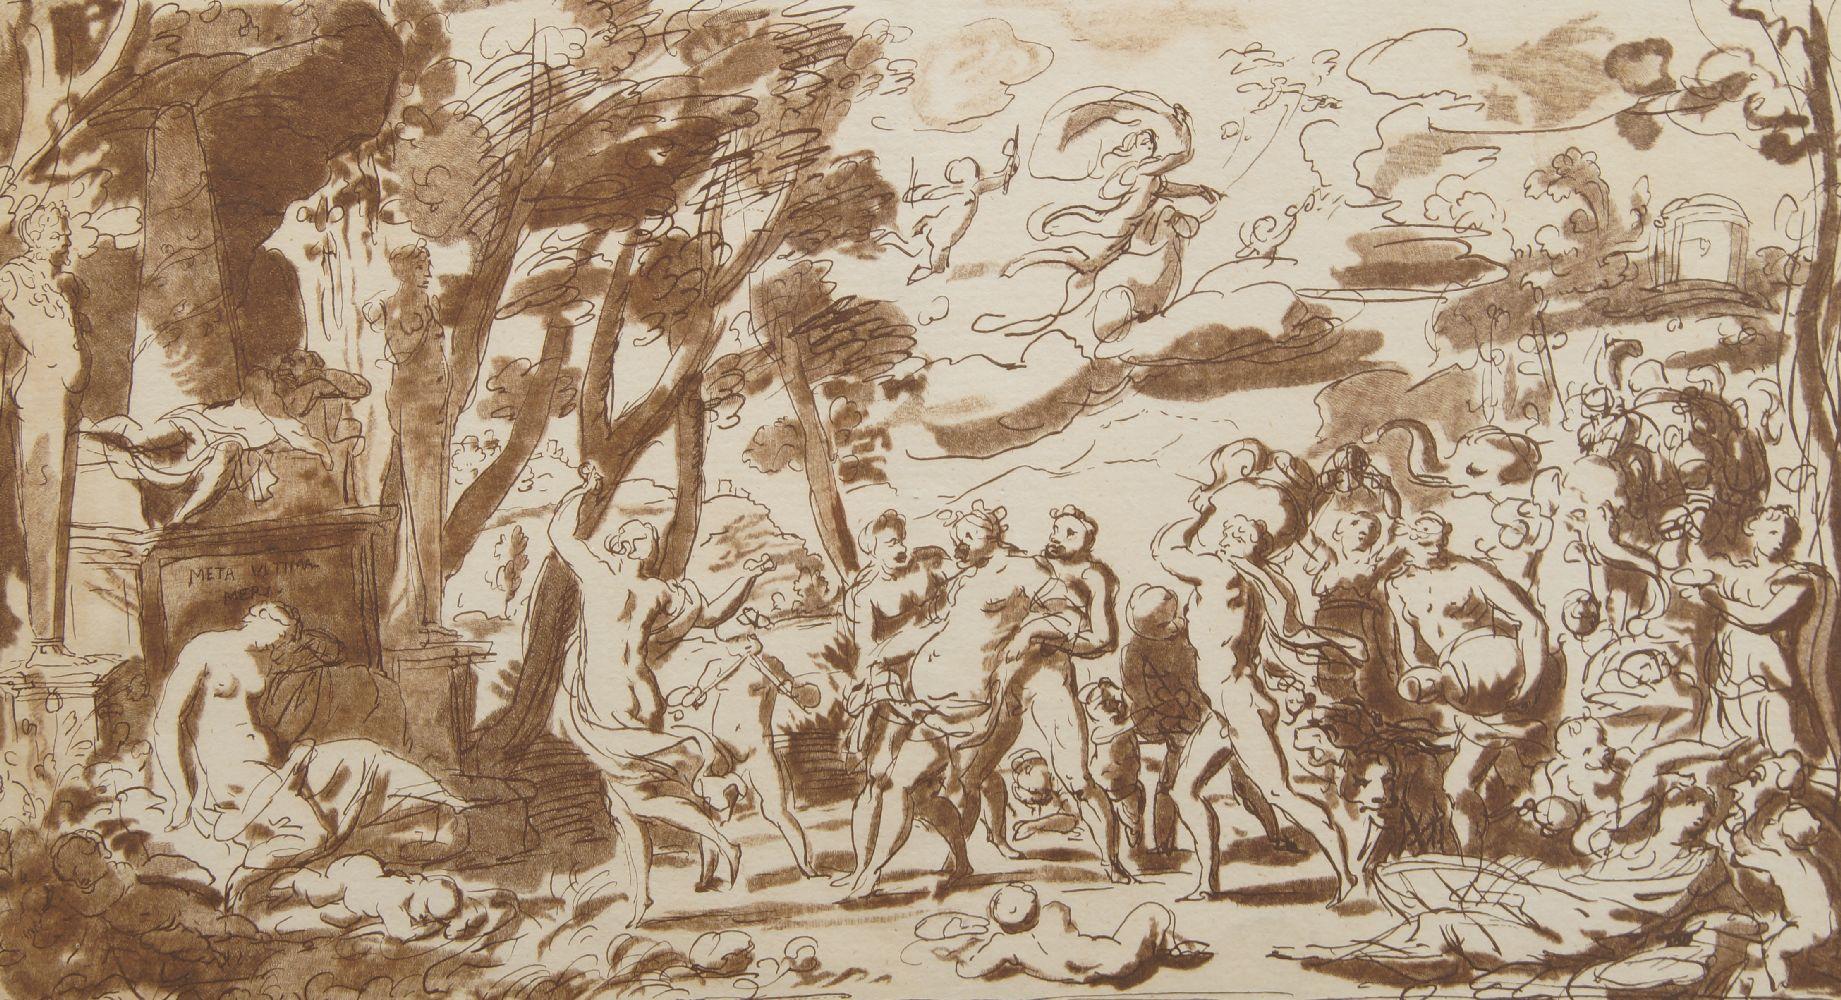 William Wynne Ryland, British 1738-1783- Jupiter and Juno, after Baccio Bandinelli; etching - Image 2 of 2